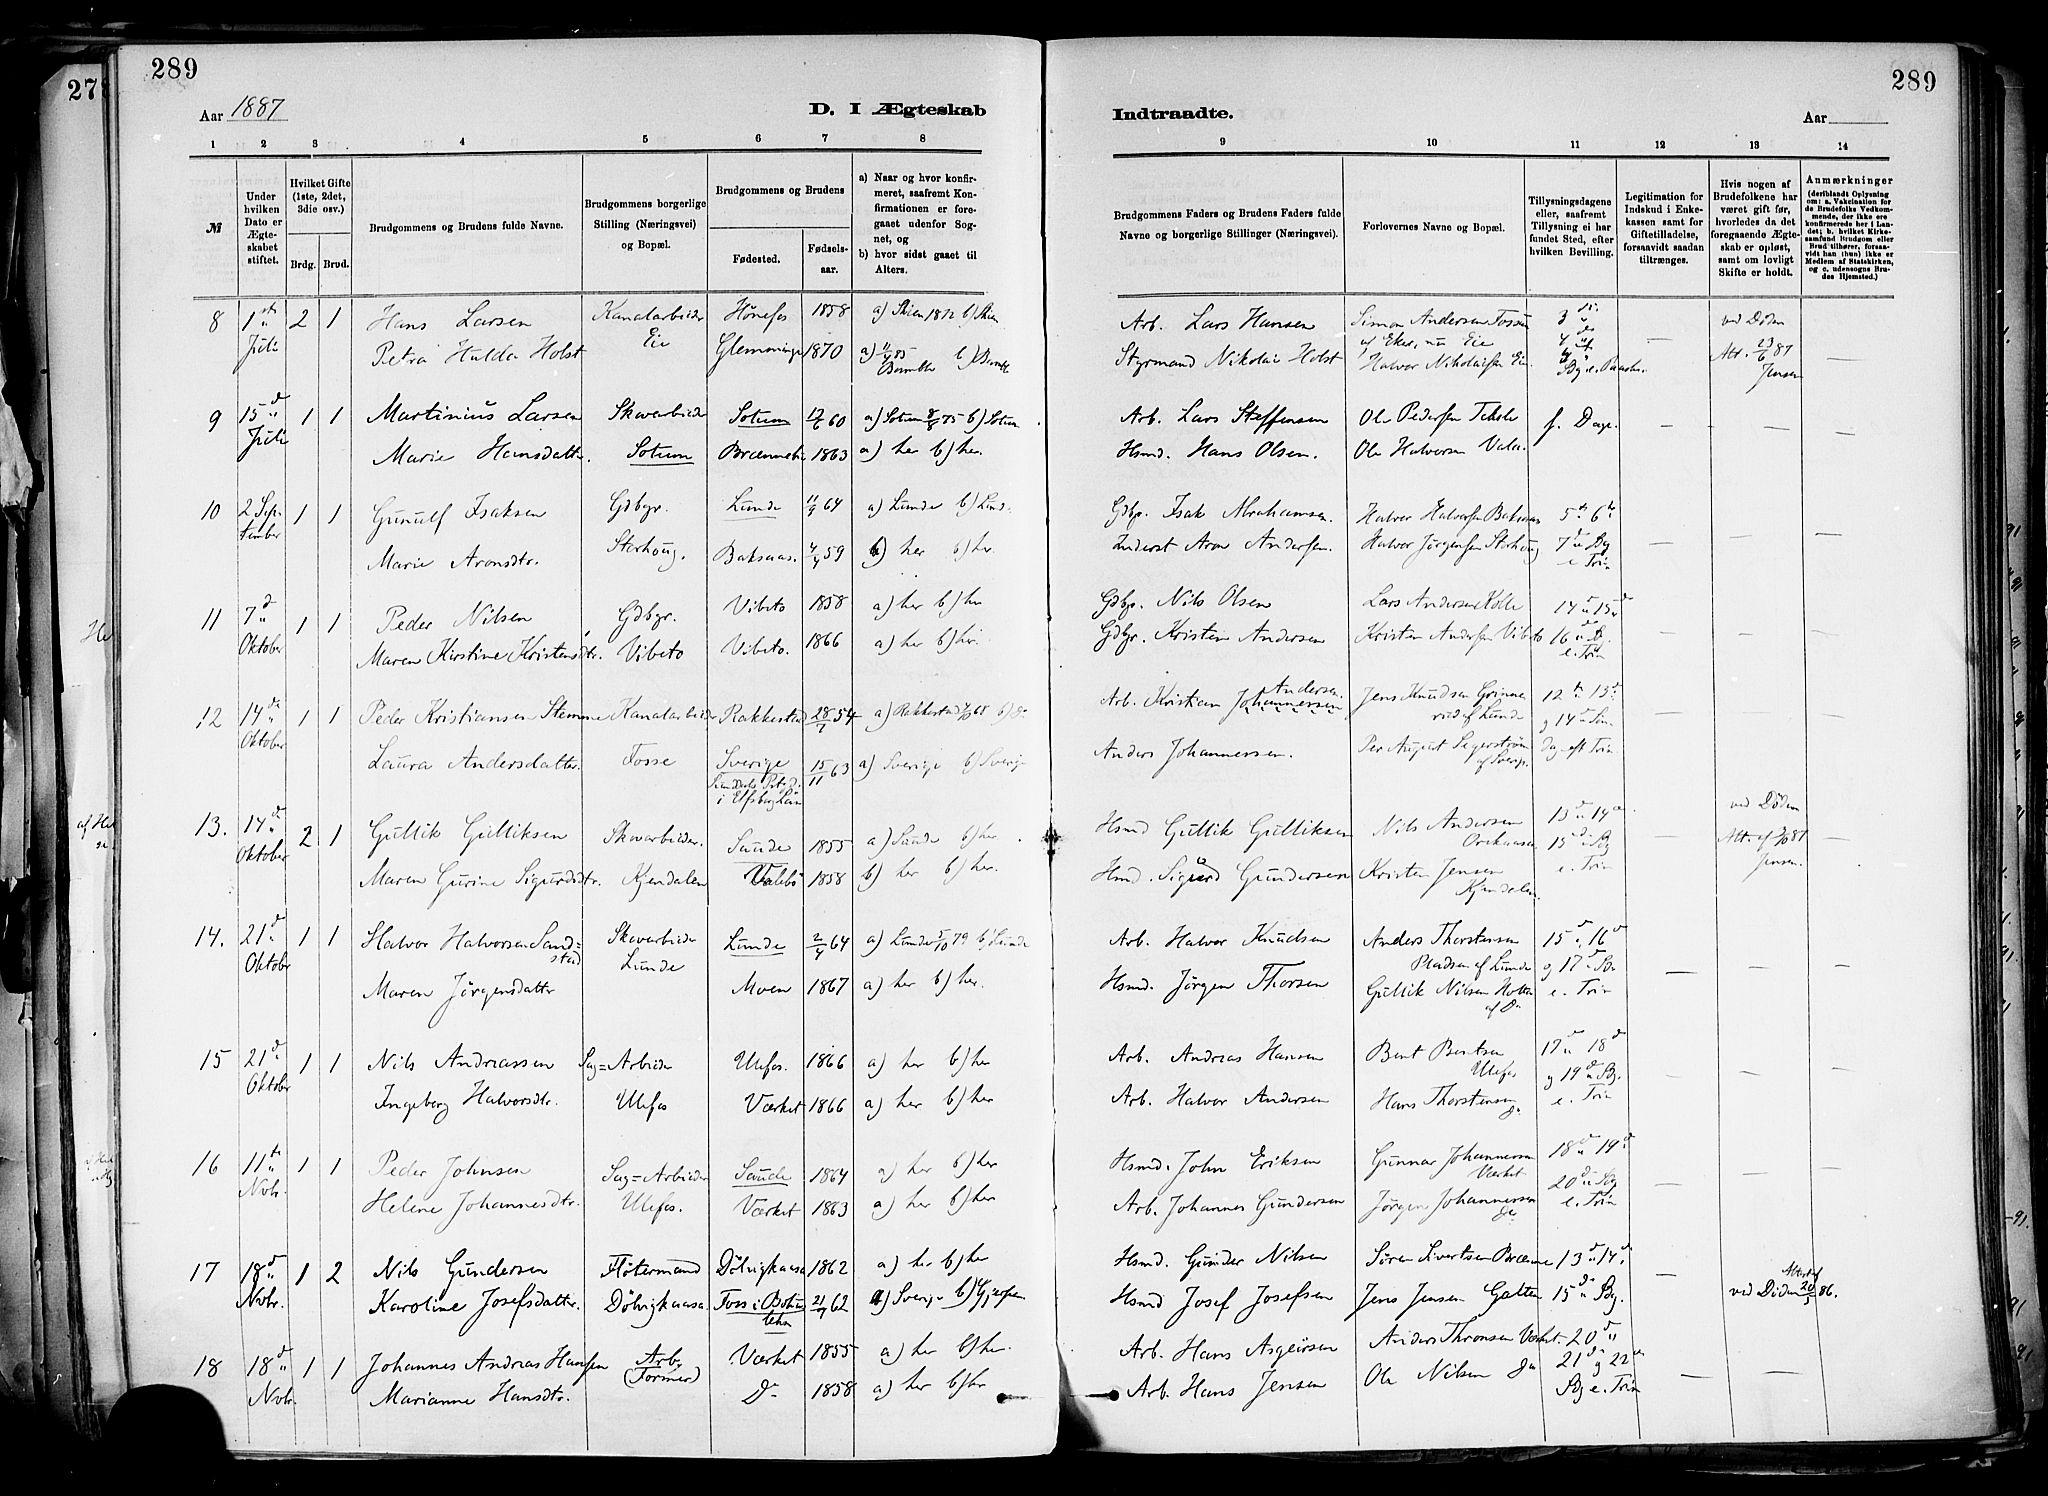 SAKO, Holla kirkebøker, F/Fa/L0008: Ministerialbok nr. 8, 1882-1897, s. 289